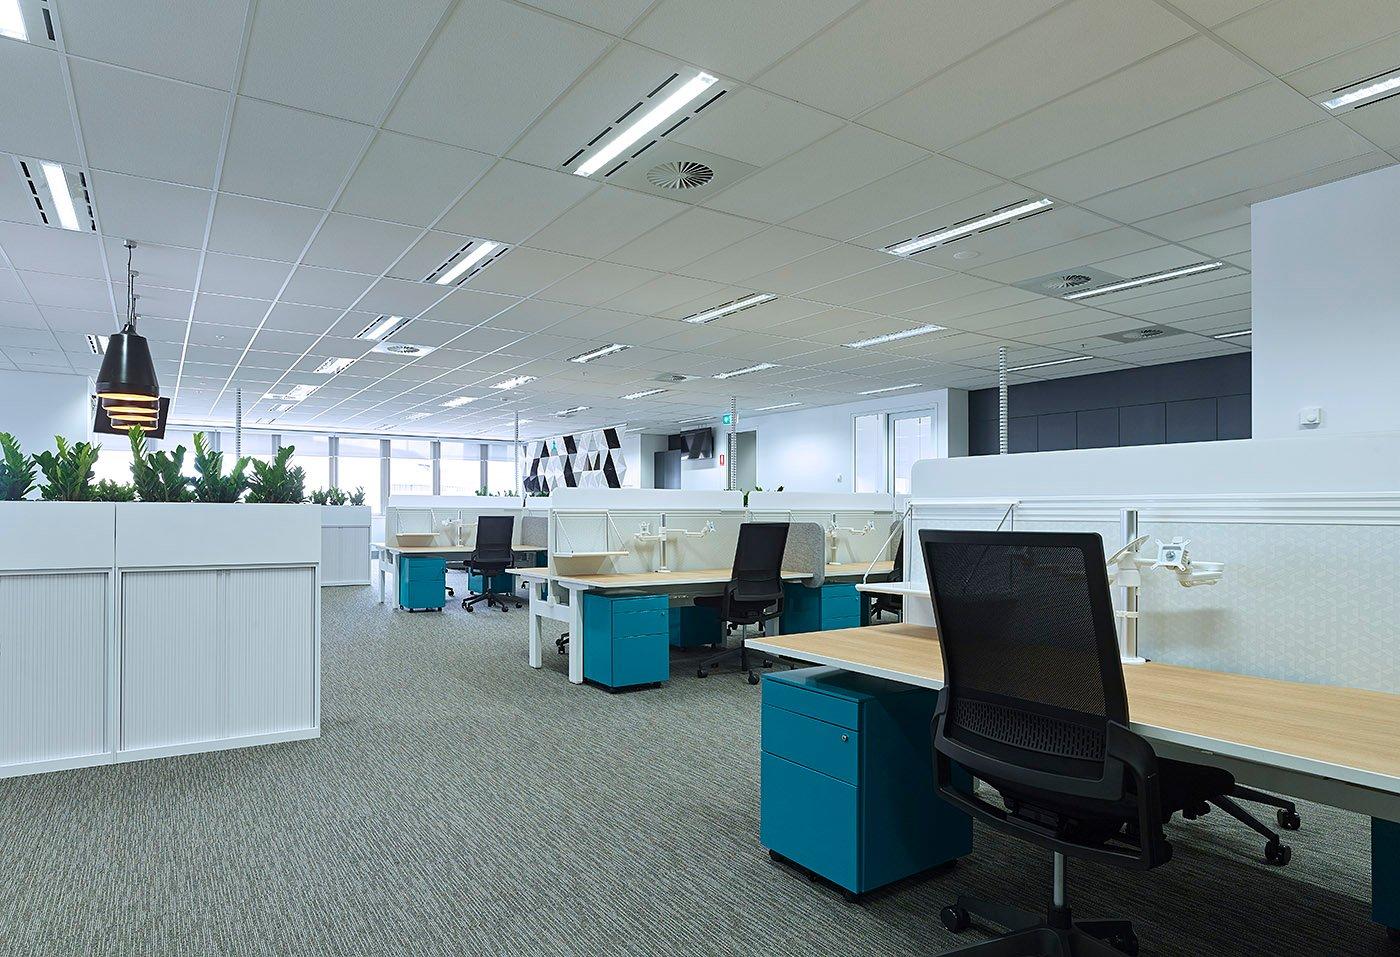 Ausure Brisbane Tenant Representation, Interior Design, Project & Construction Management Project Image 6 by PCG